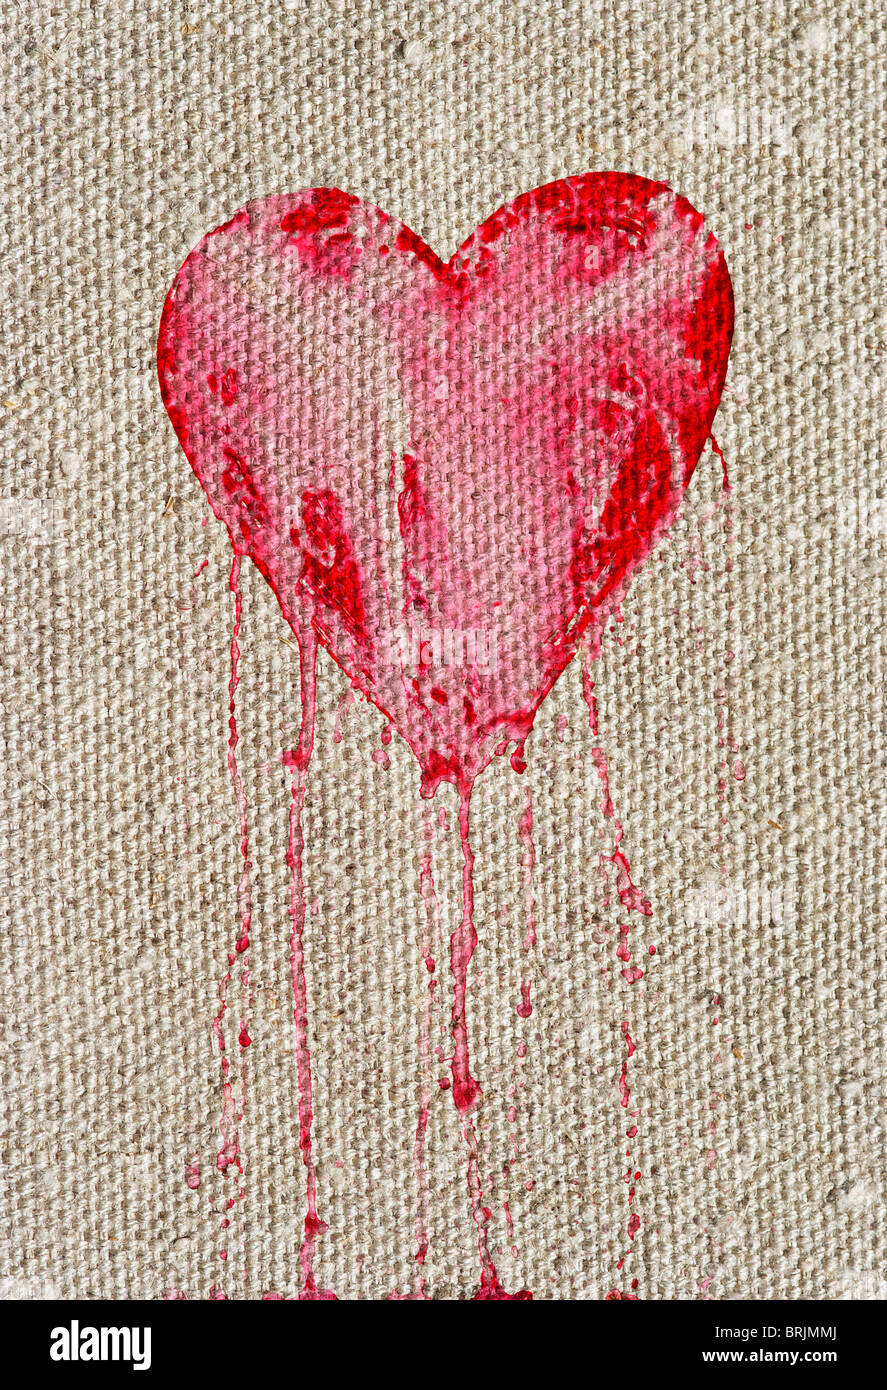 Bleeding heart symbol of love in grunge style stock photo bleeding heart symbol of love in grunge style buycottarizona